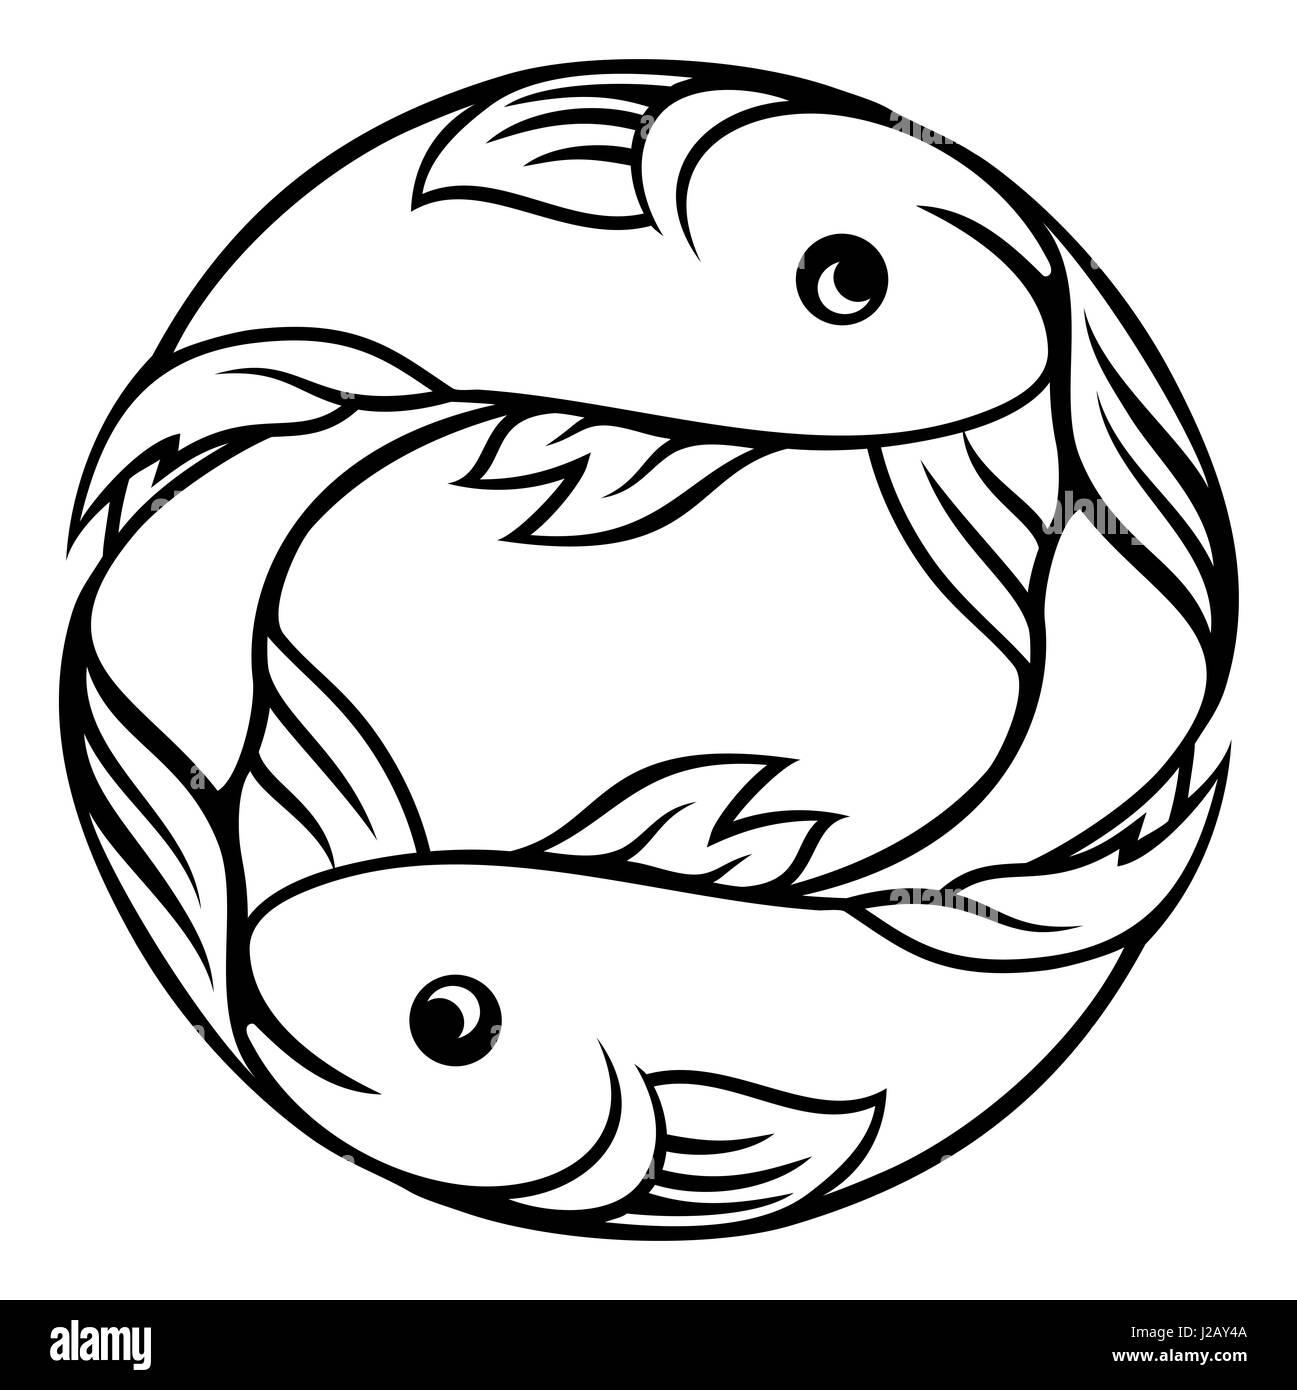 A pisces fish horoscope astrology zodiac sign symbol stock photo a pisces fish horoscope astrology zodiac sign symbol buycottarizona